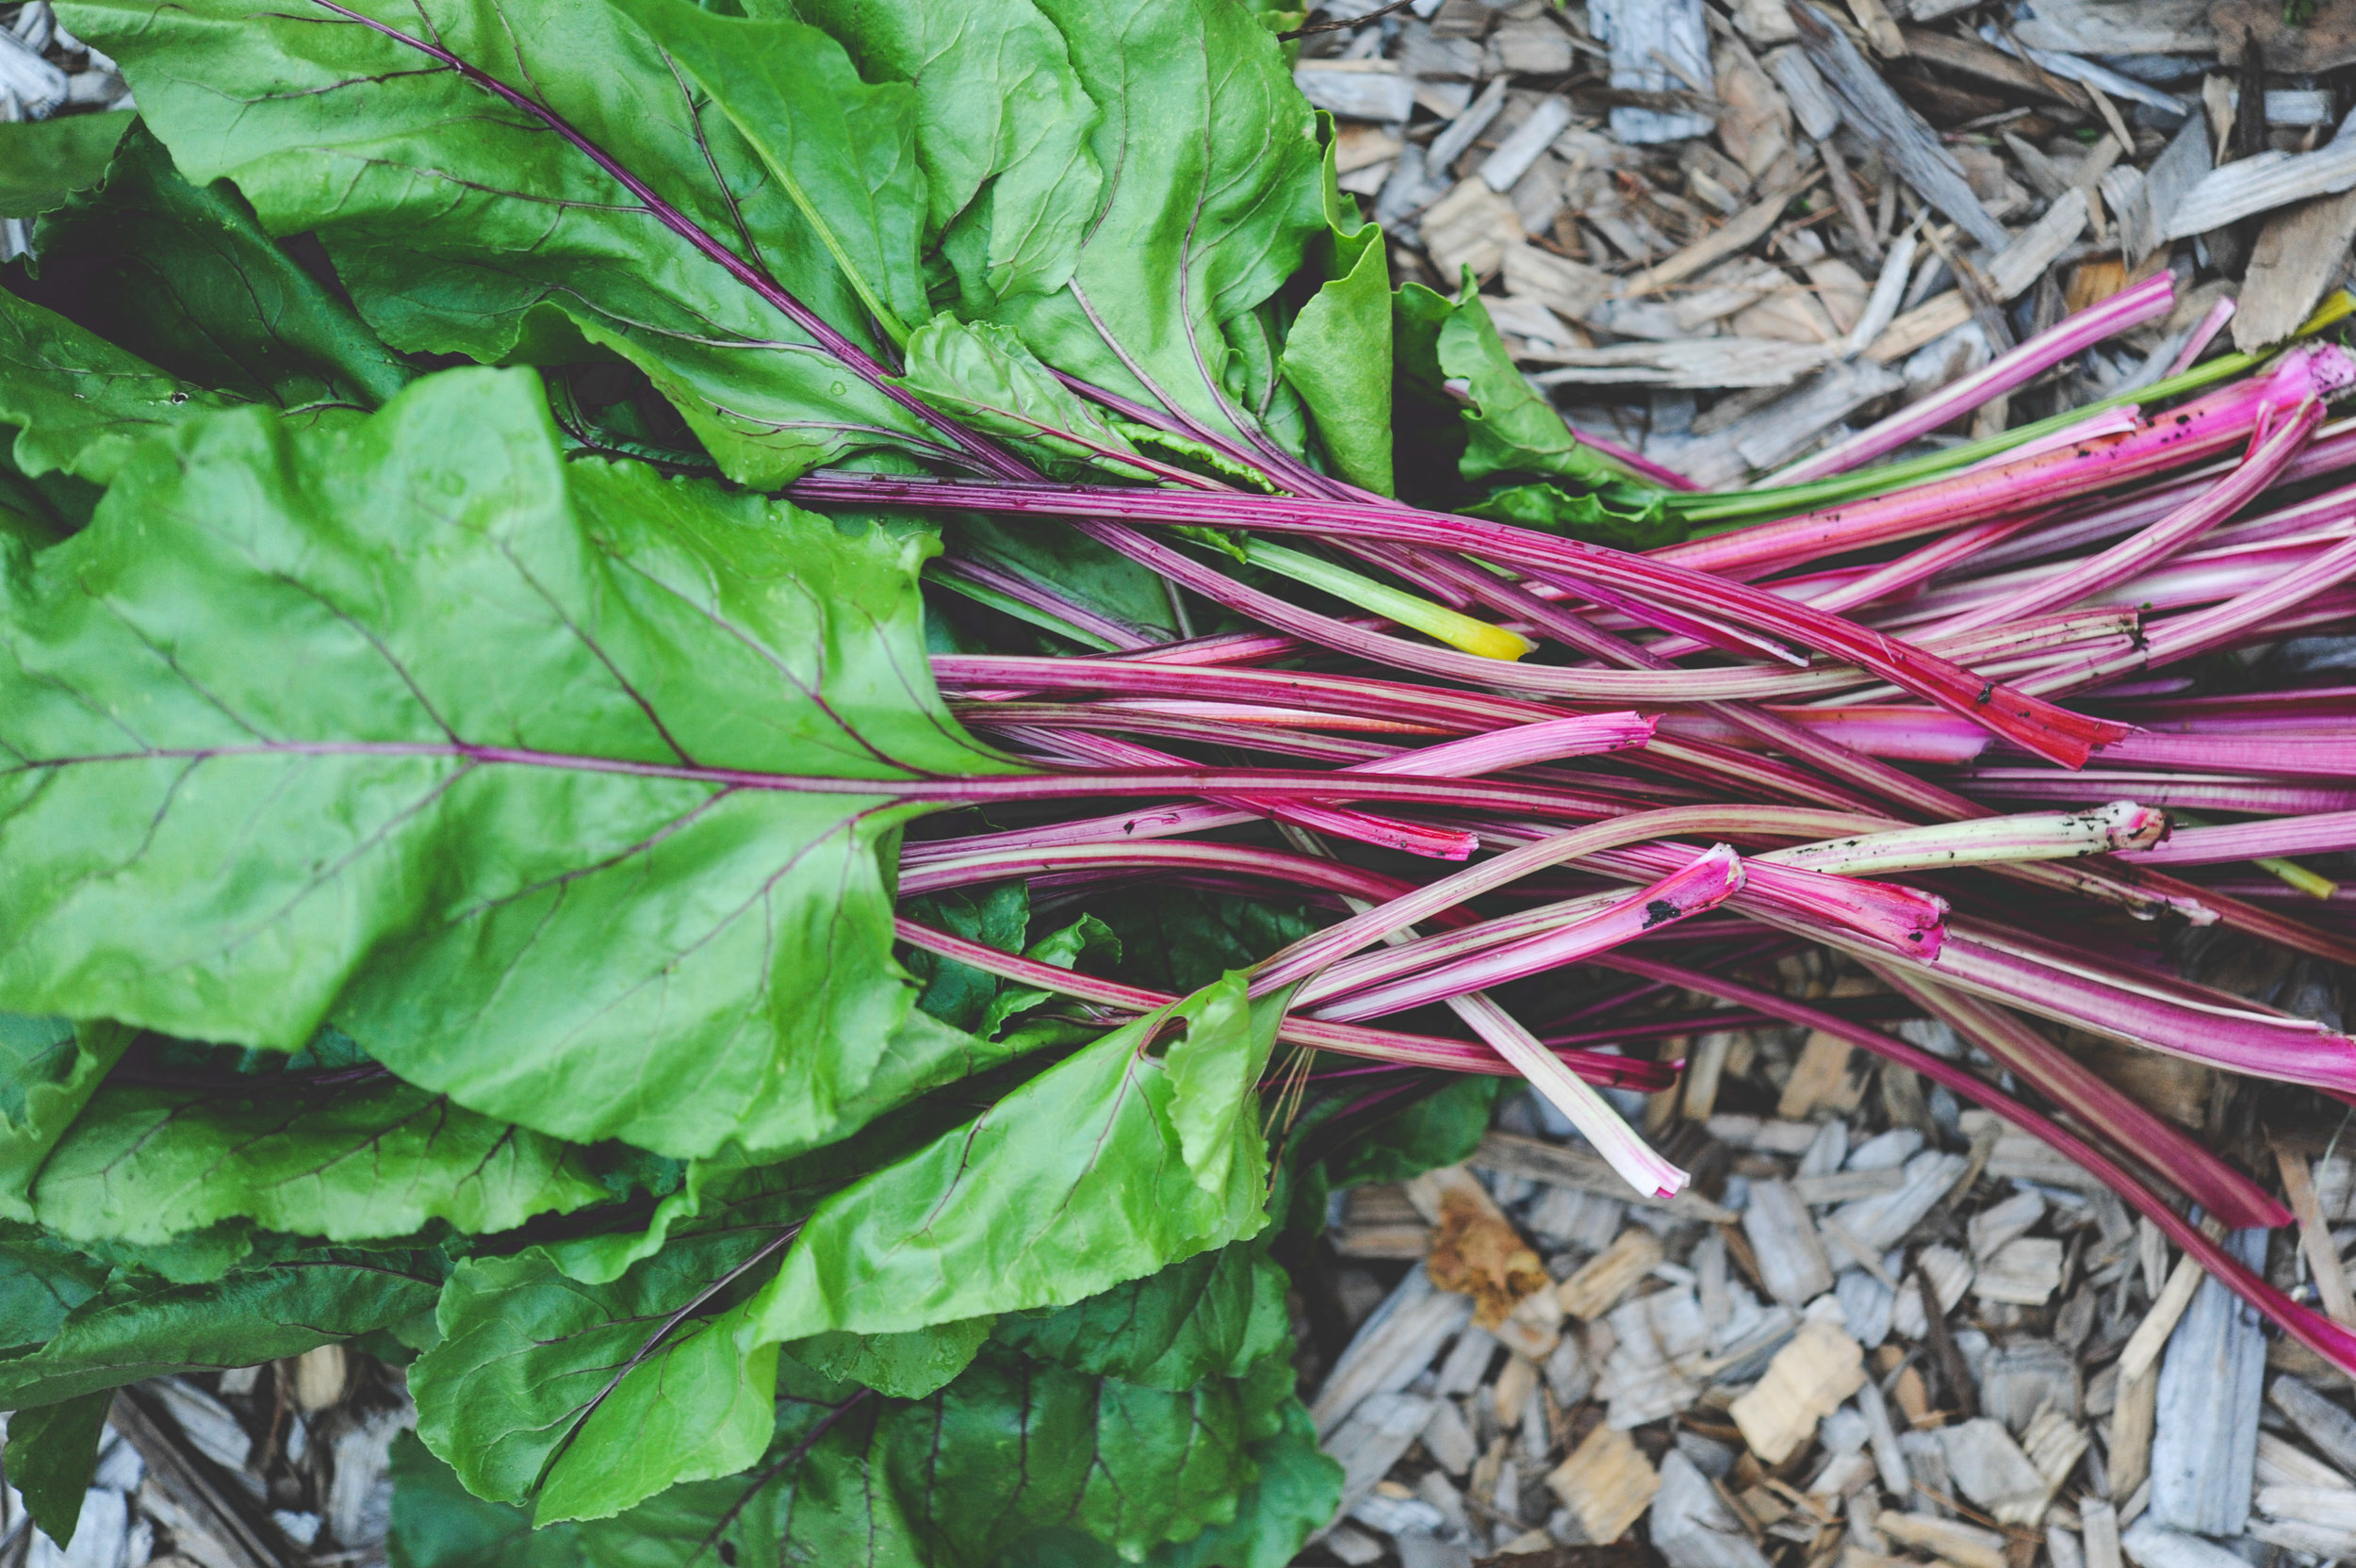 Encyclopedia Botanica Podcast_Seattle Urban Farm Co.